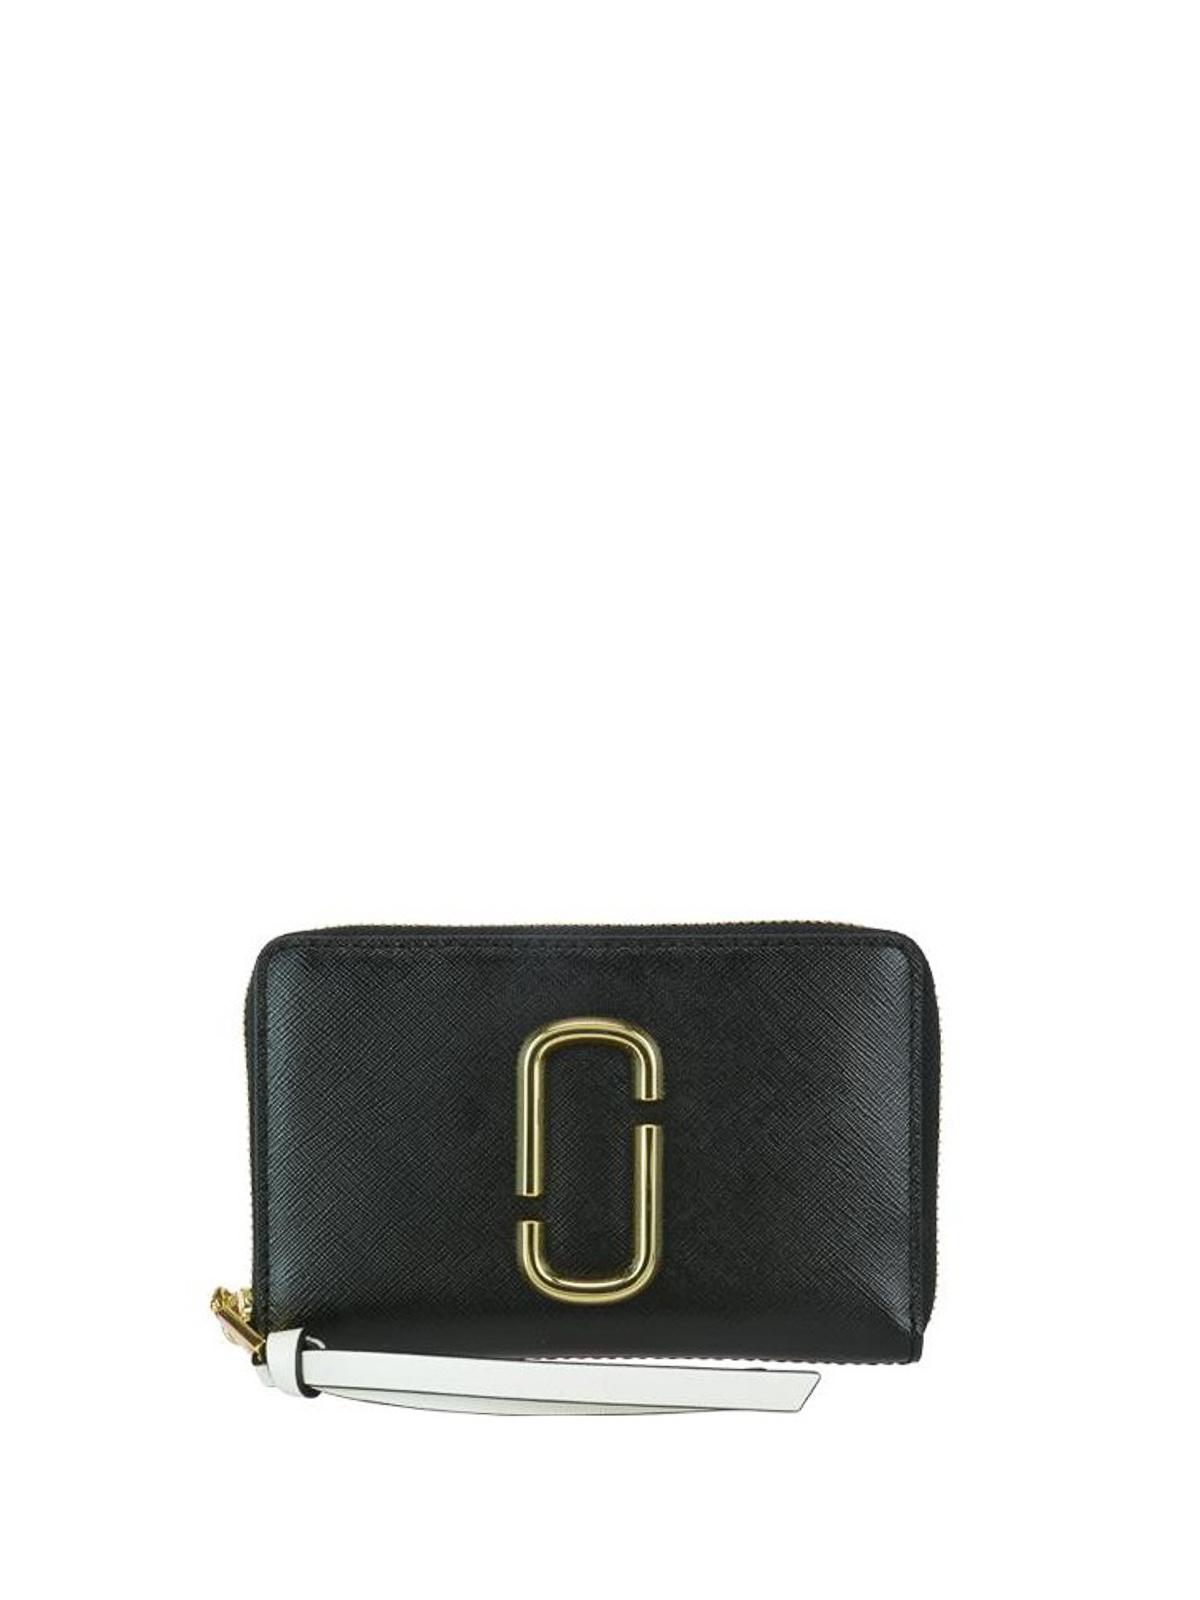 99cbde2bd6 Marc Jacobs - Snapshot black and pink wallet - wallets & purses ...